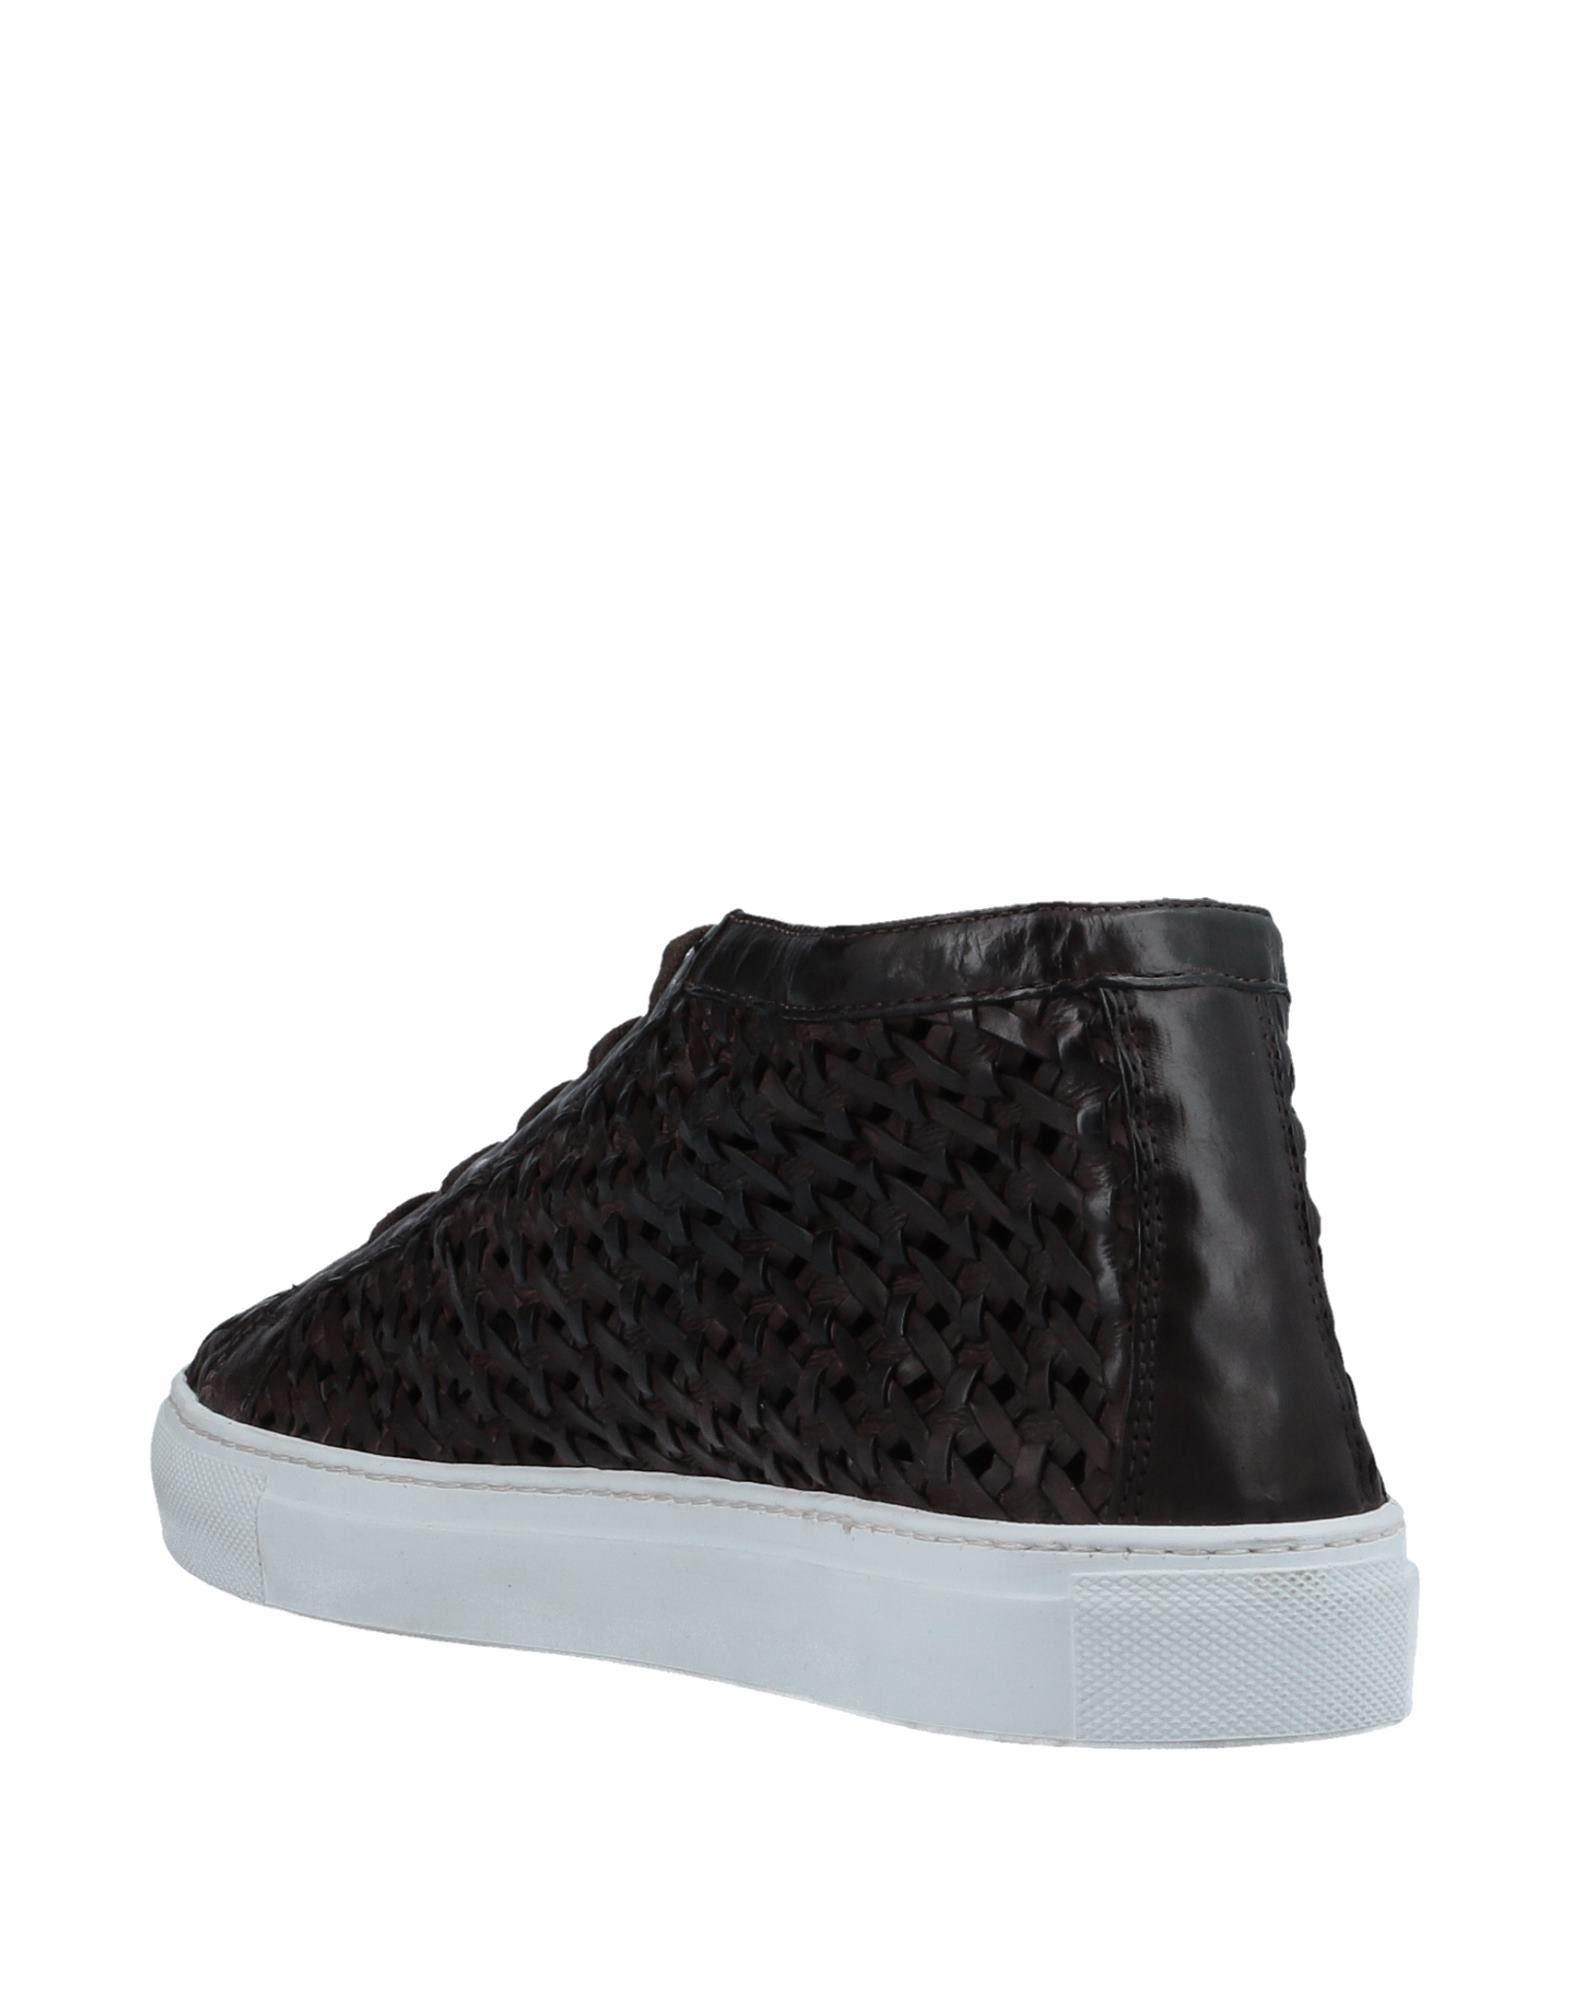 Fabiano Ricci Gute Sneakers Herren  11508942QM Gute Ricci Qualität beliebte Schuhe 594086